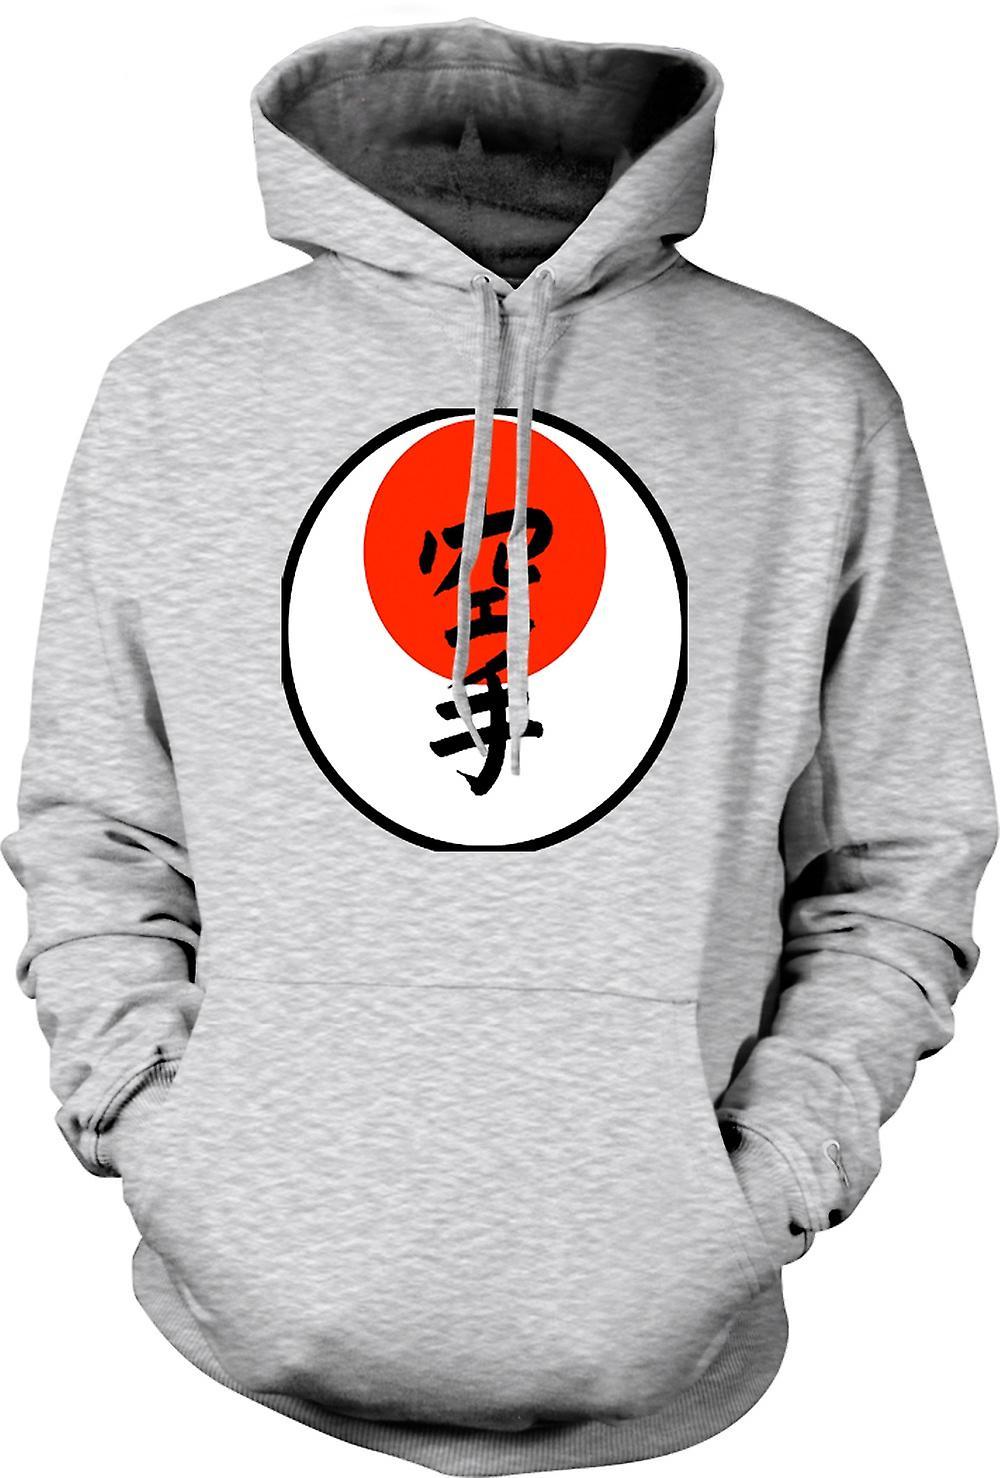 Felpa con cappuccio uomo - giapponese Slogan - Cool